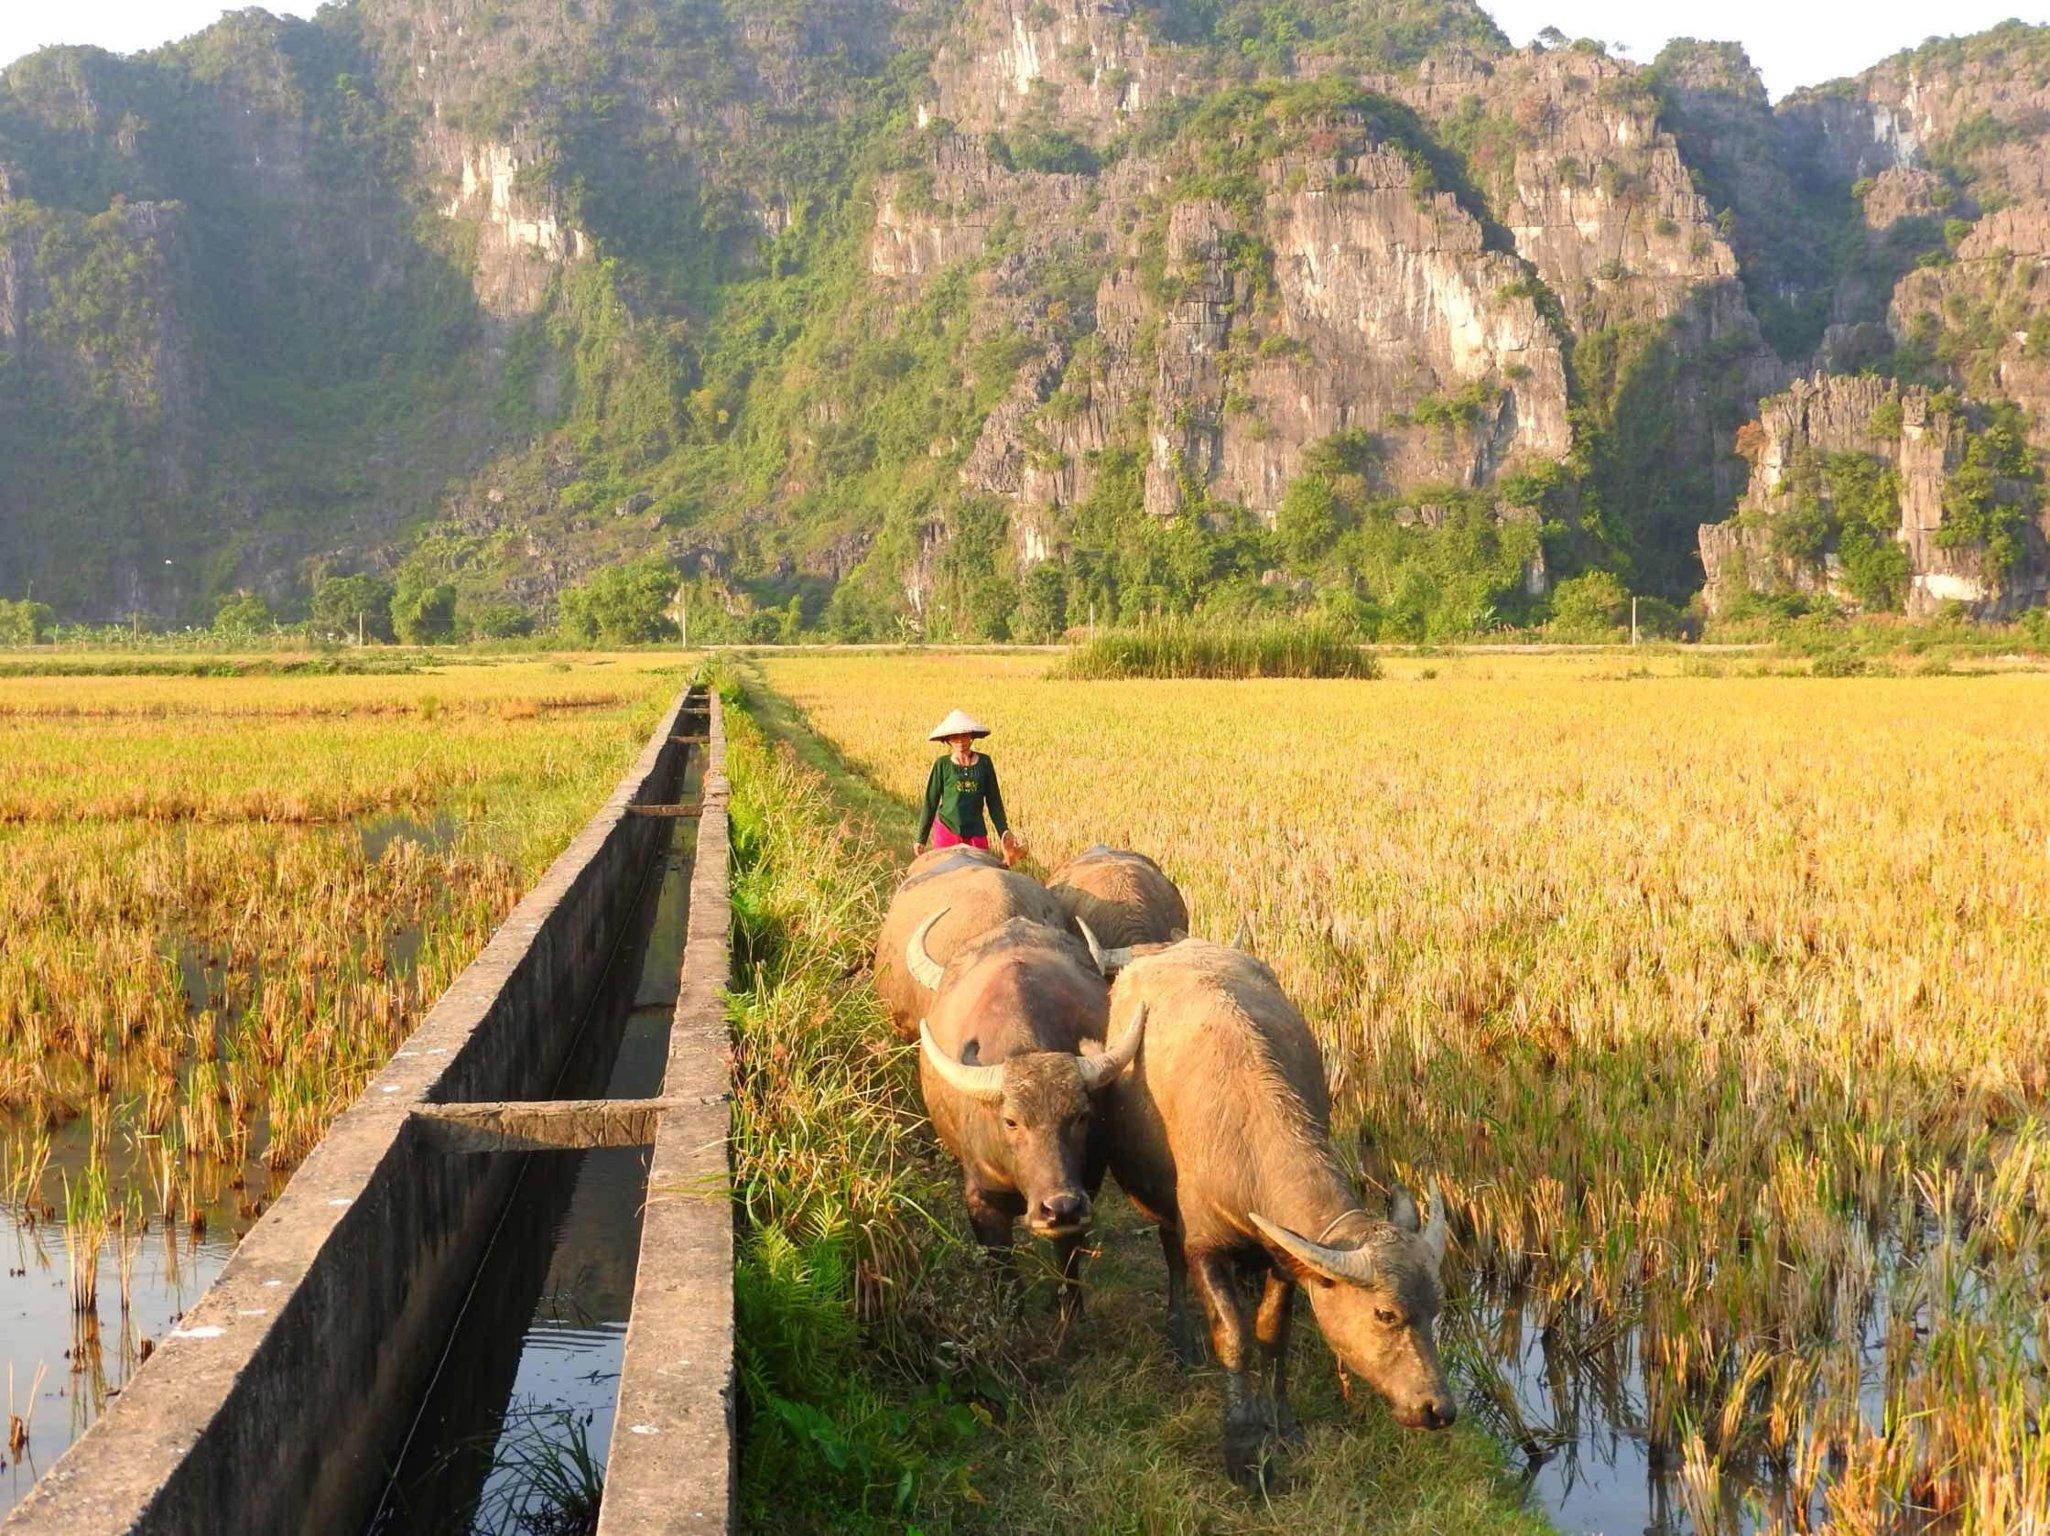 1-Day Ancient Capital of Ninh Binh - Vietnam Itinerary